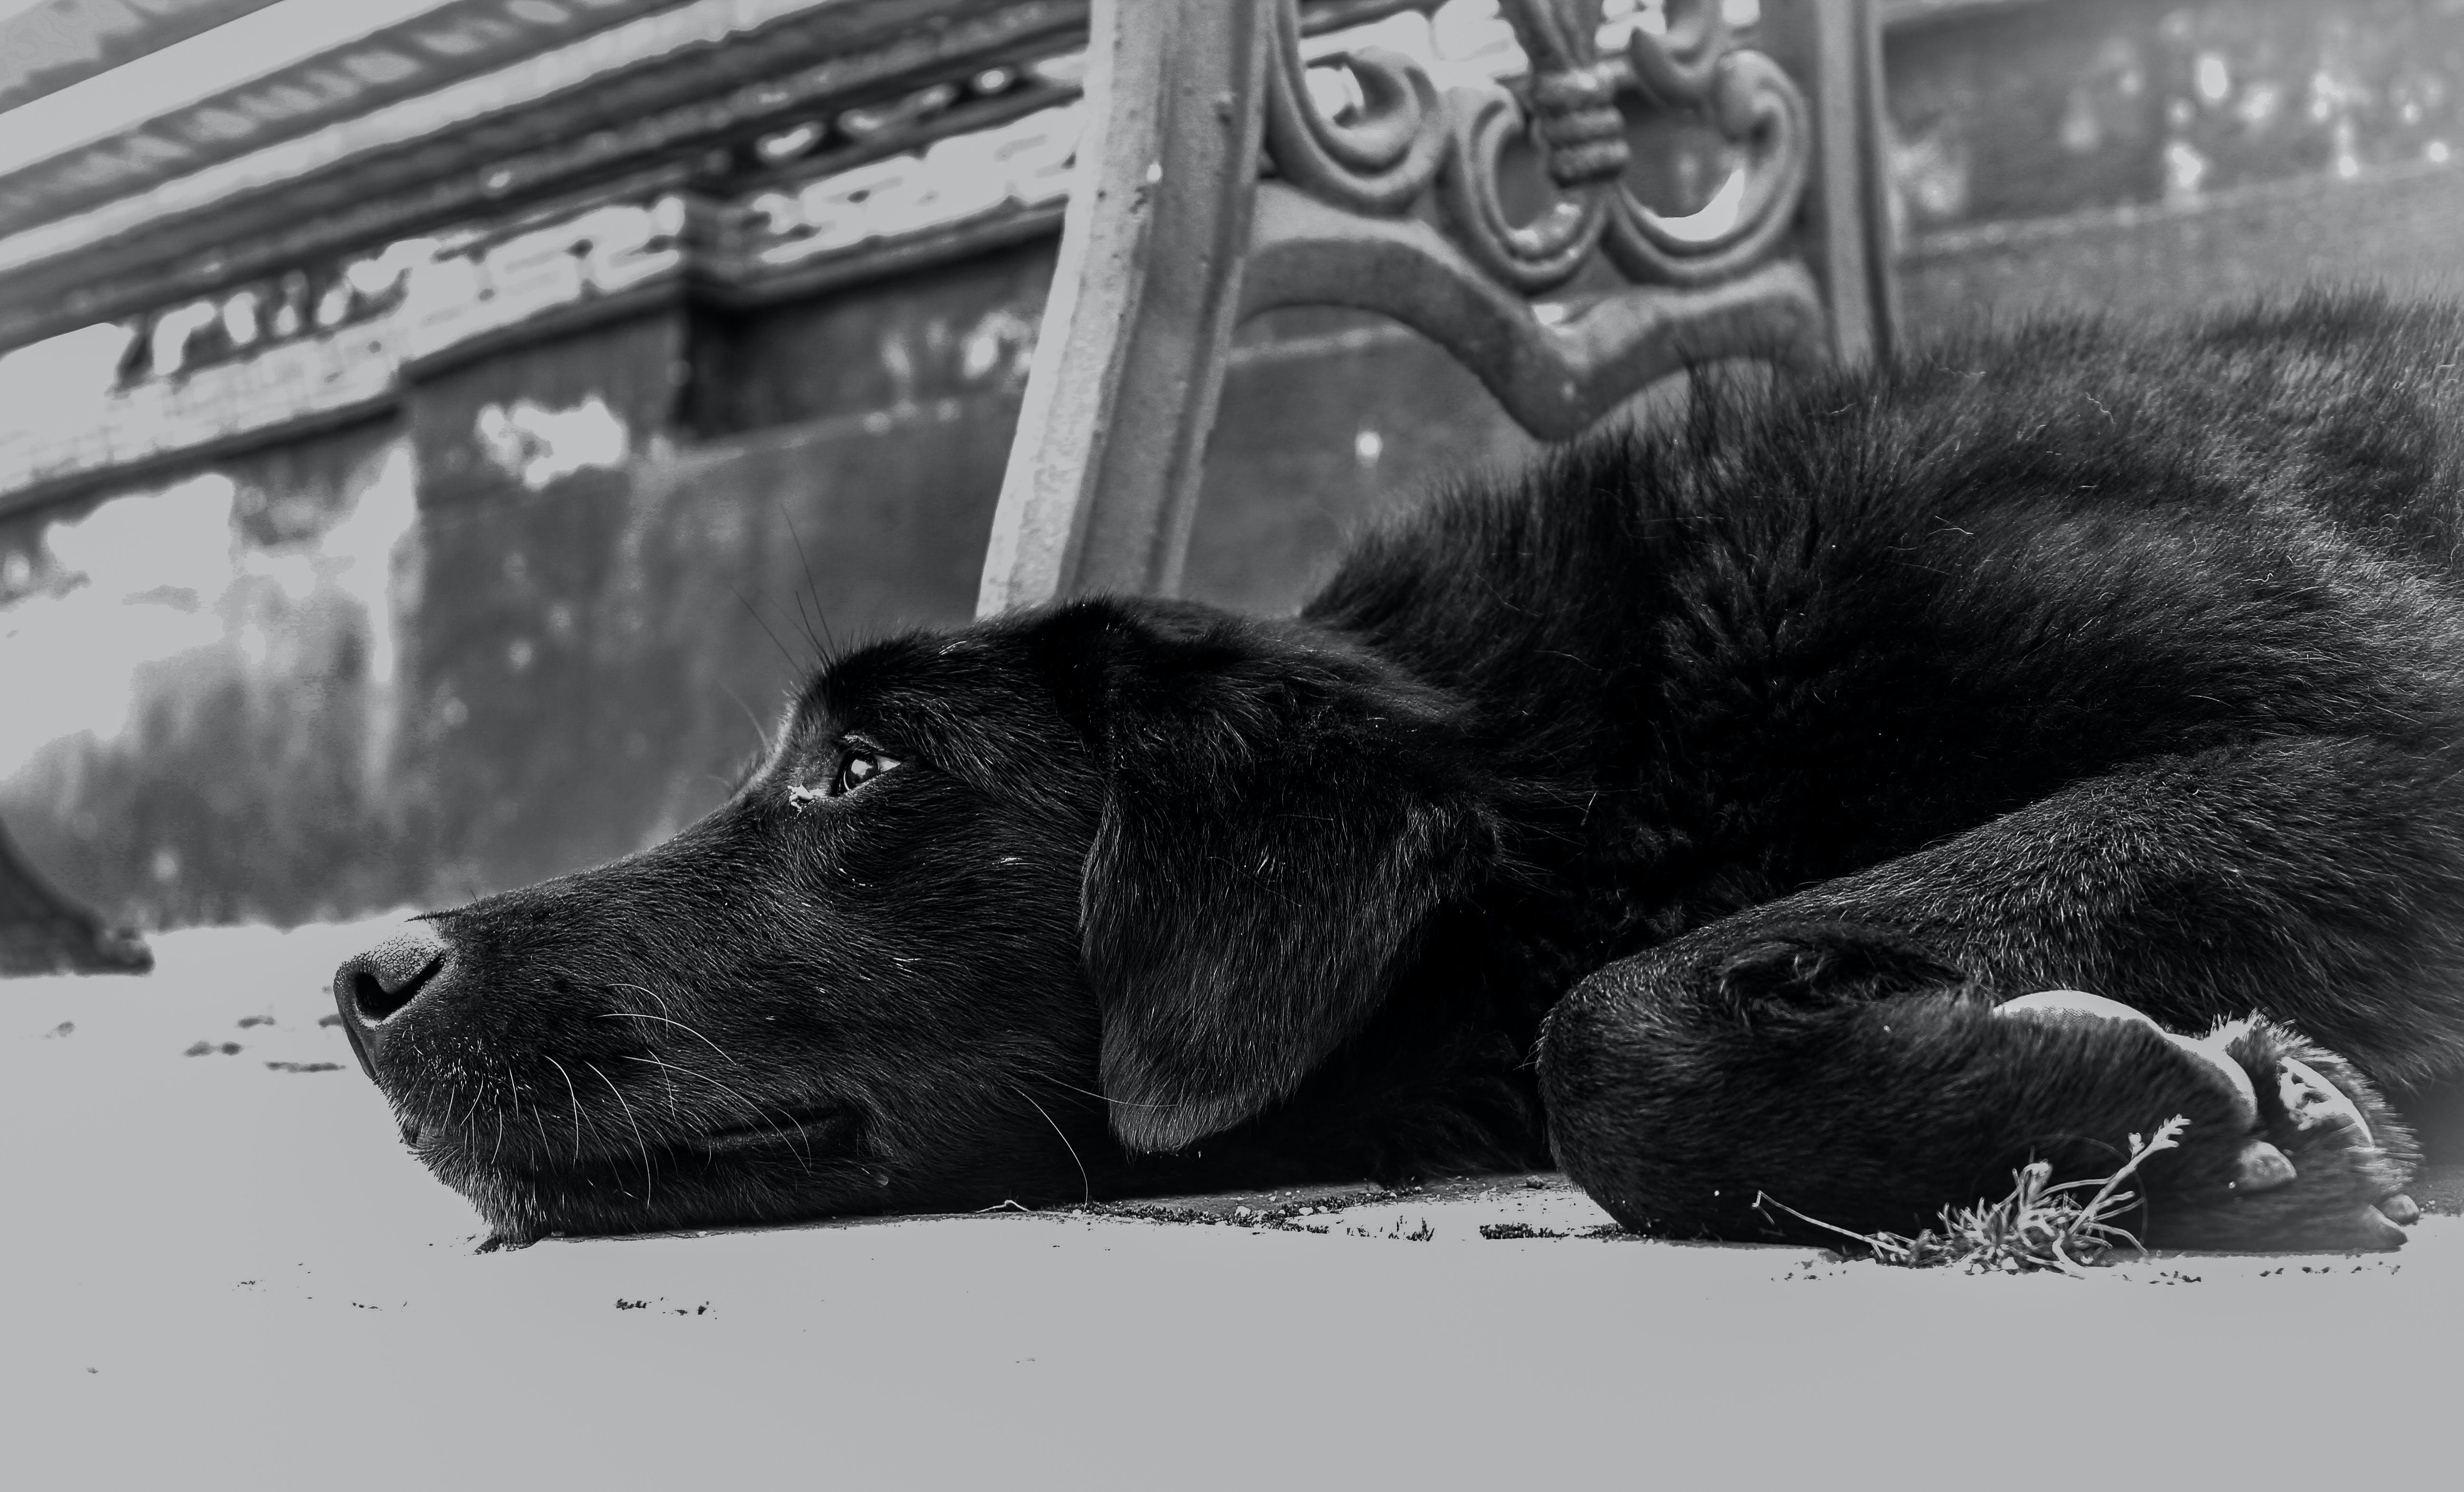 Closeup Photo of Dog Lying on the Ground